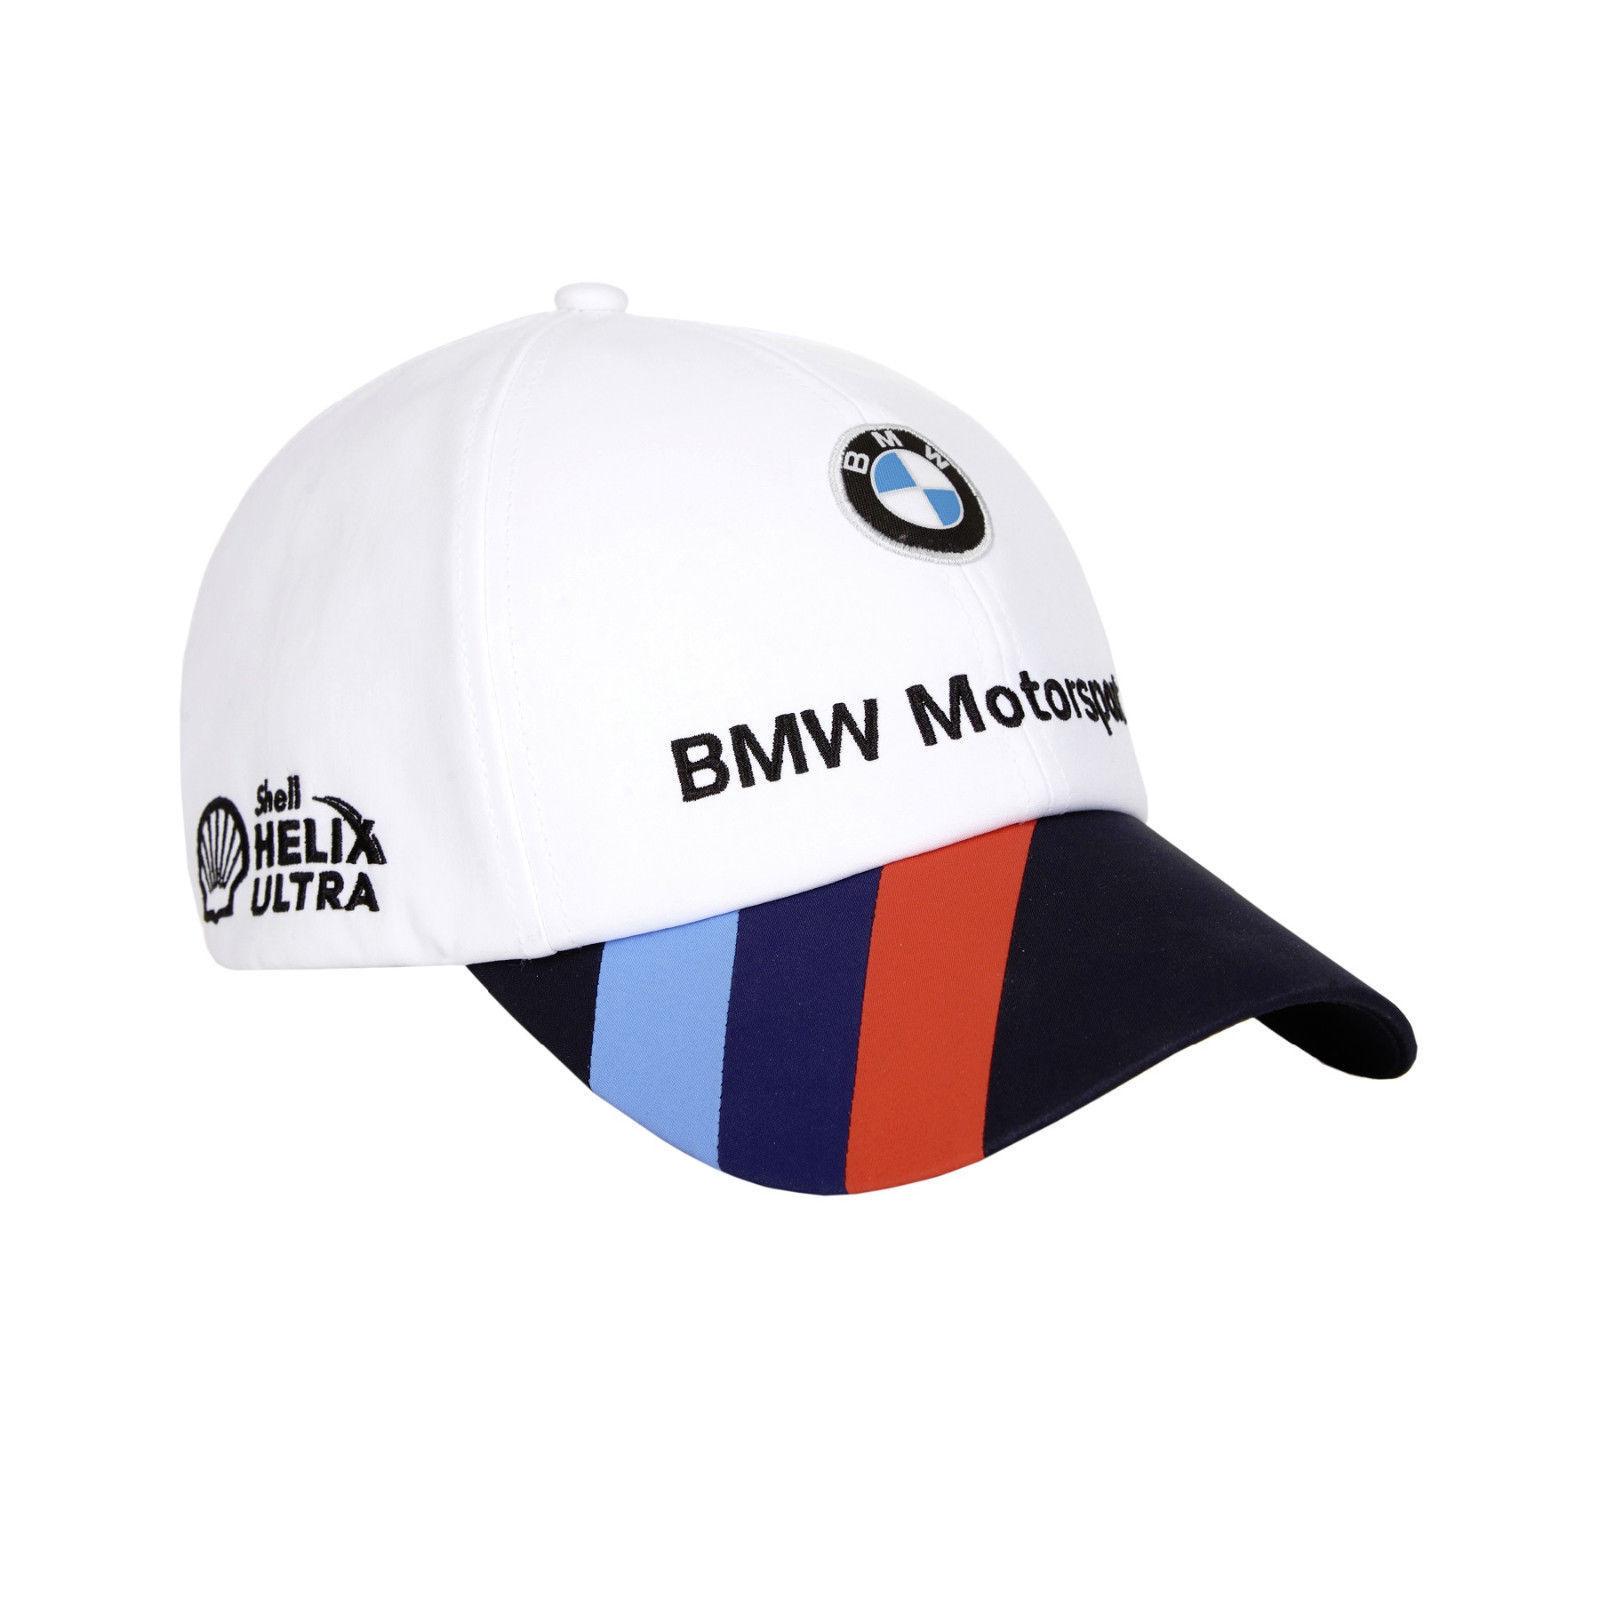 b5ddb8c1 ... new zealand awesome bmw motorsports puma logo mens white adjustable  strap team hat m v power shell